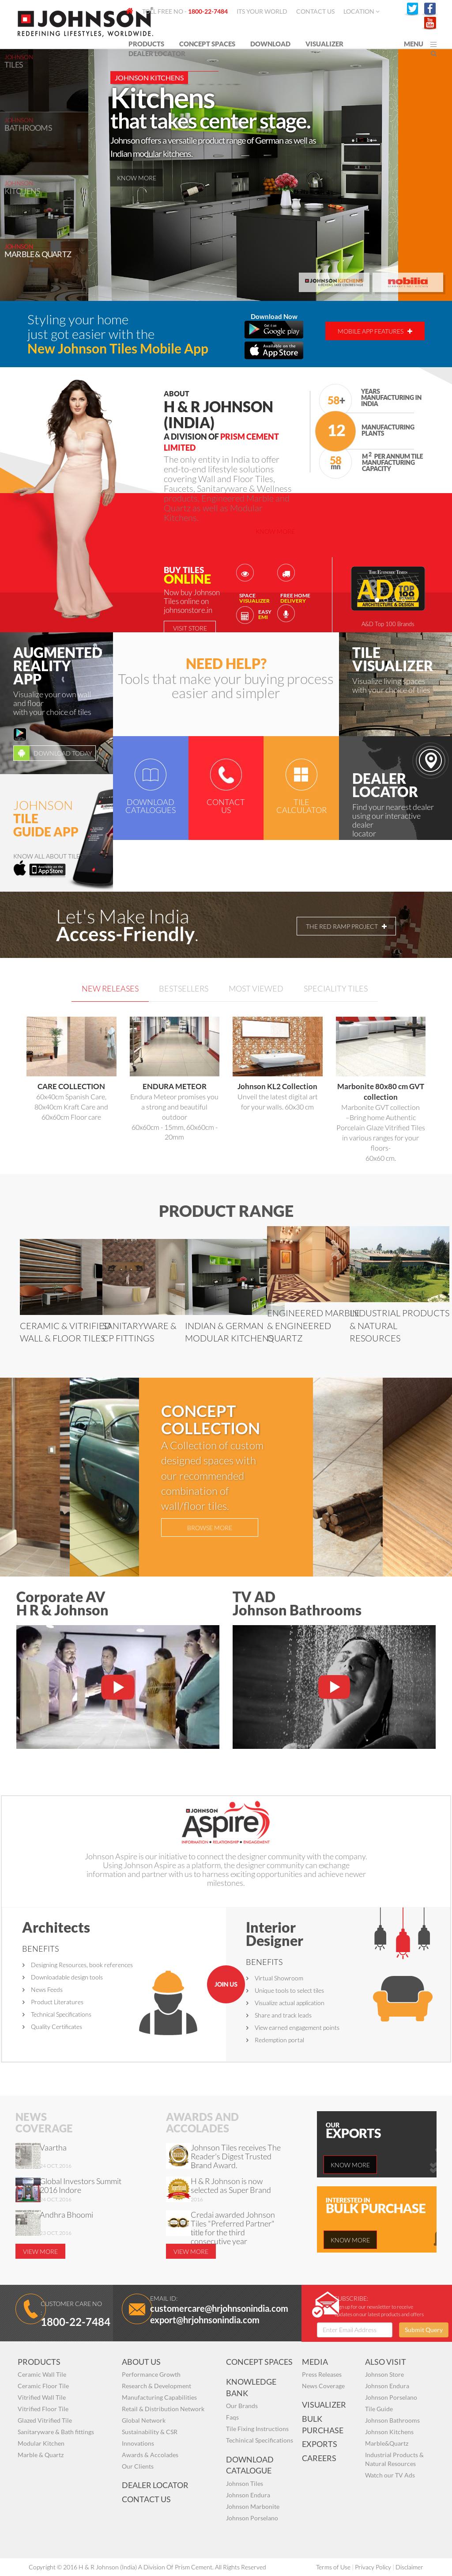 Owler Reports Press Release Johnson Neo Digital Ceramic Tiles Market In India 2015 2019